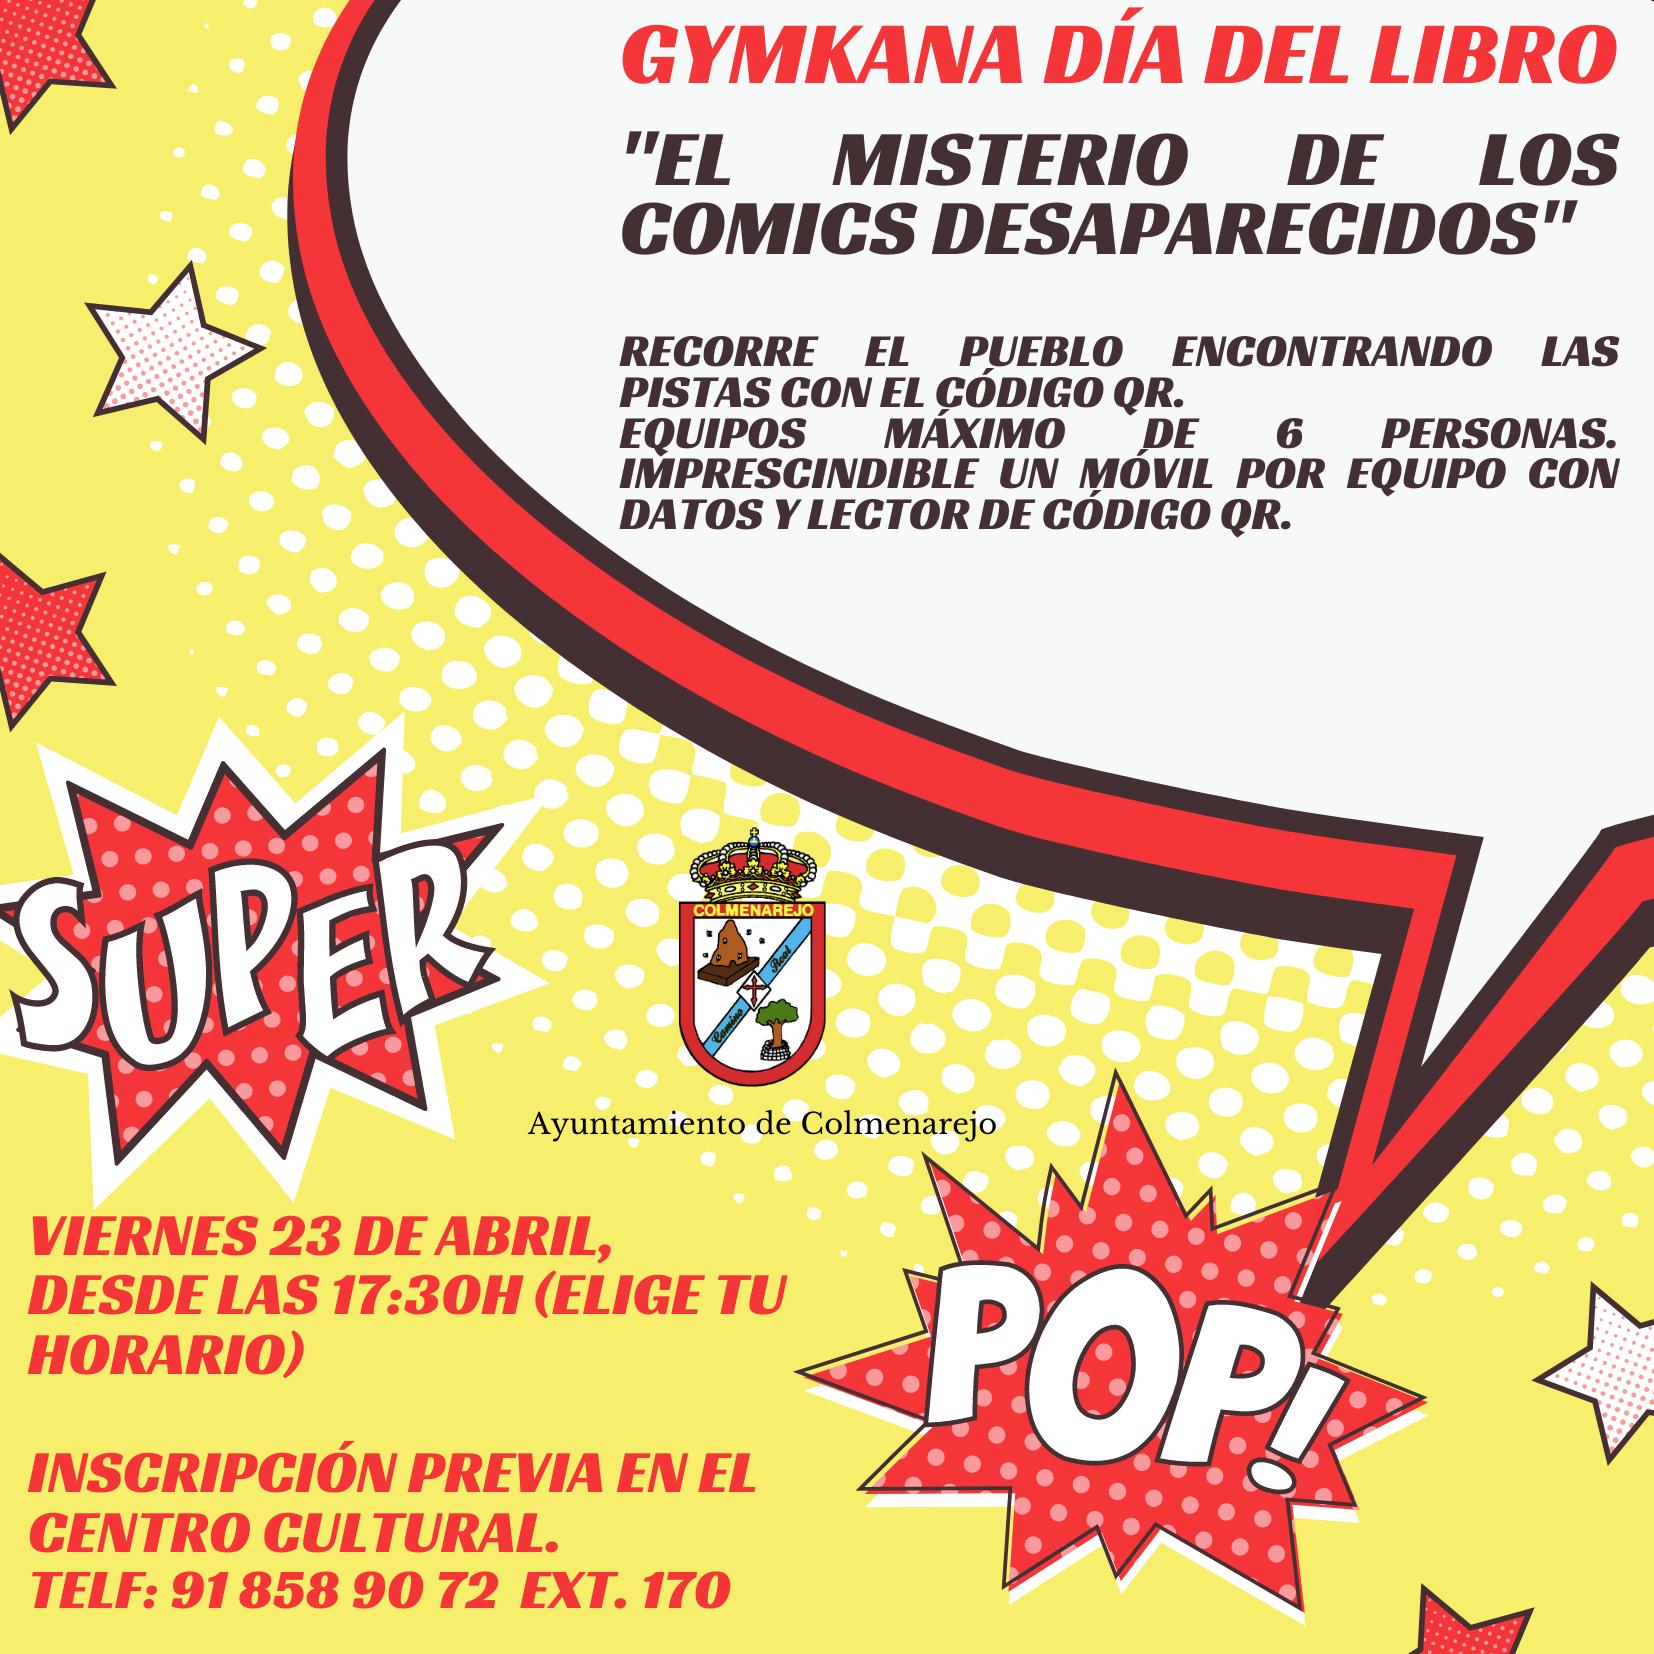 Gymkana: DÍA DEL LIBRO @ Centro Cultural